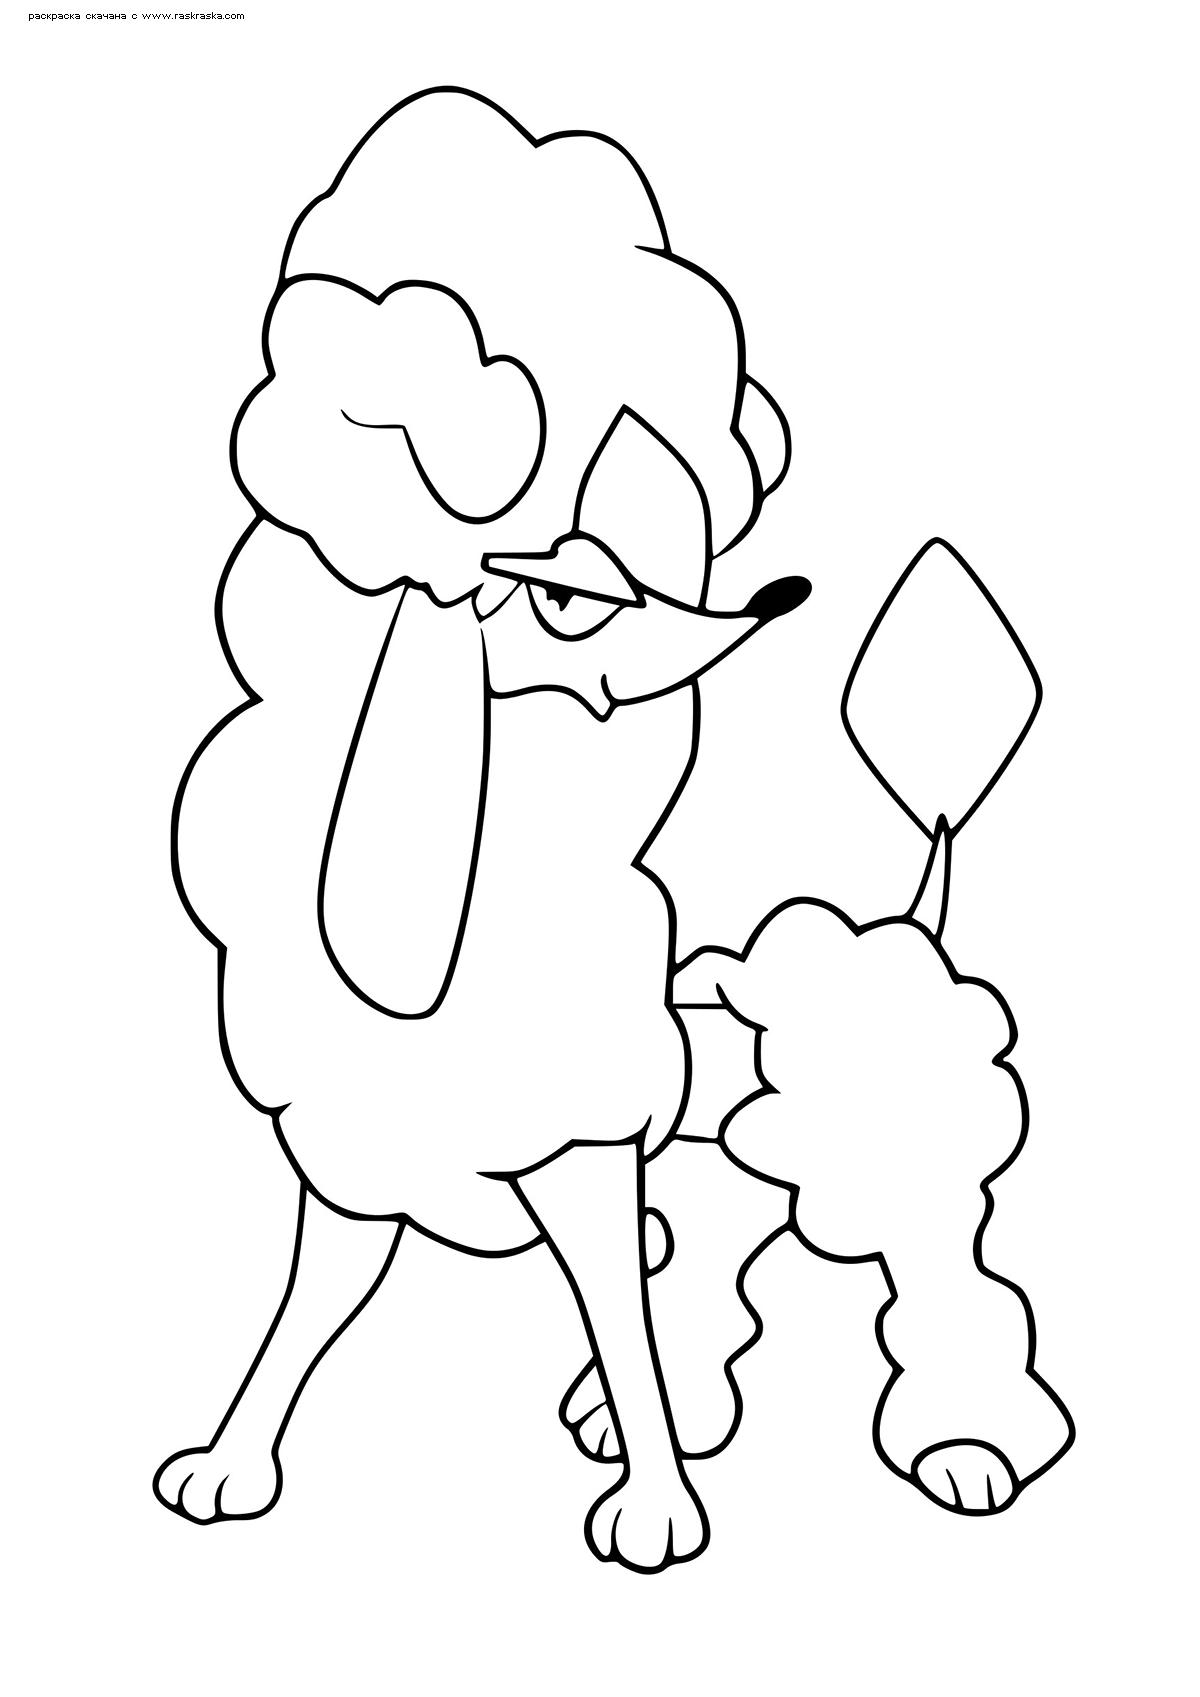 Раскраска Покемон Фурфу (Furfrou). Стиль алмаз | Раскраски ...